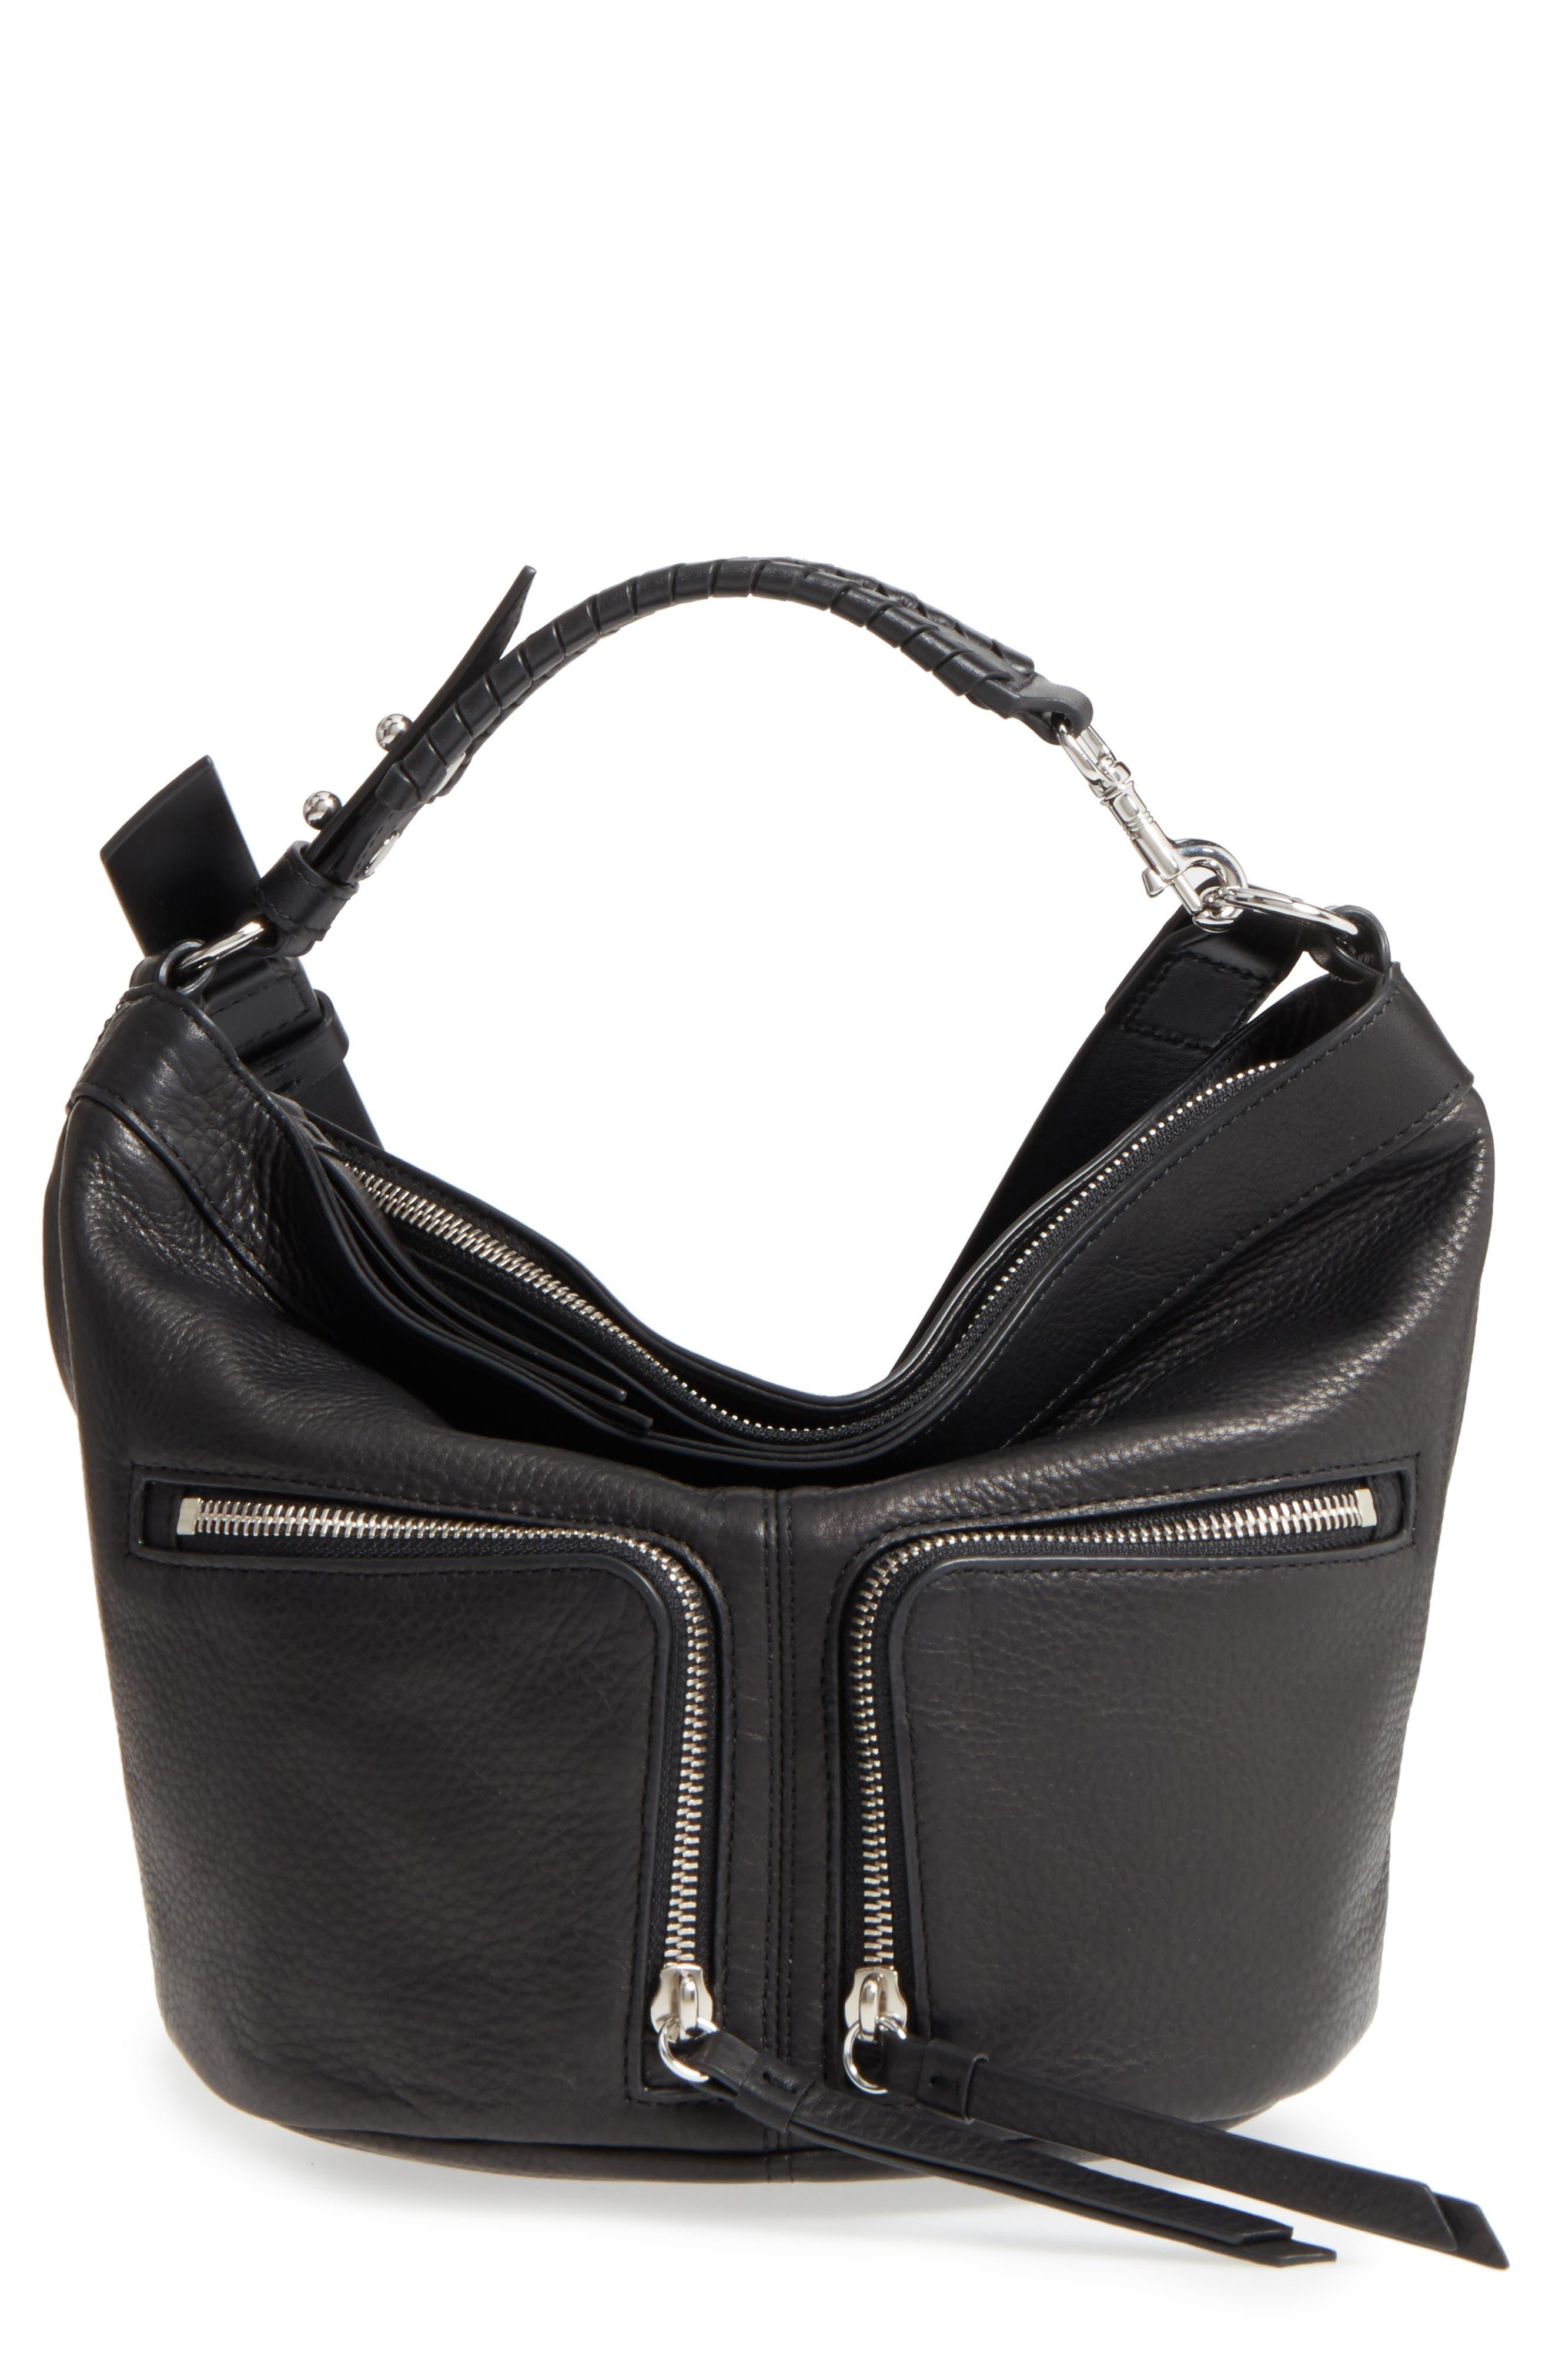 ALLSAINTS Fetch Leather Crossbody Bag